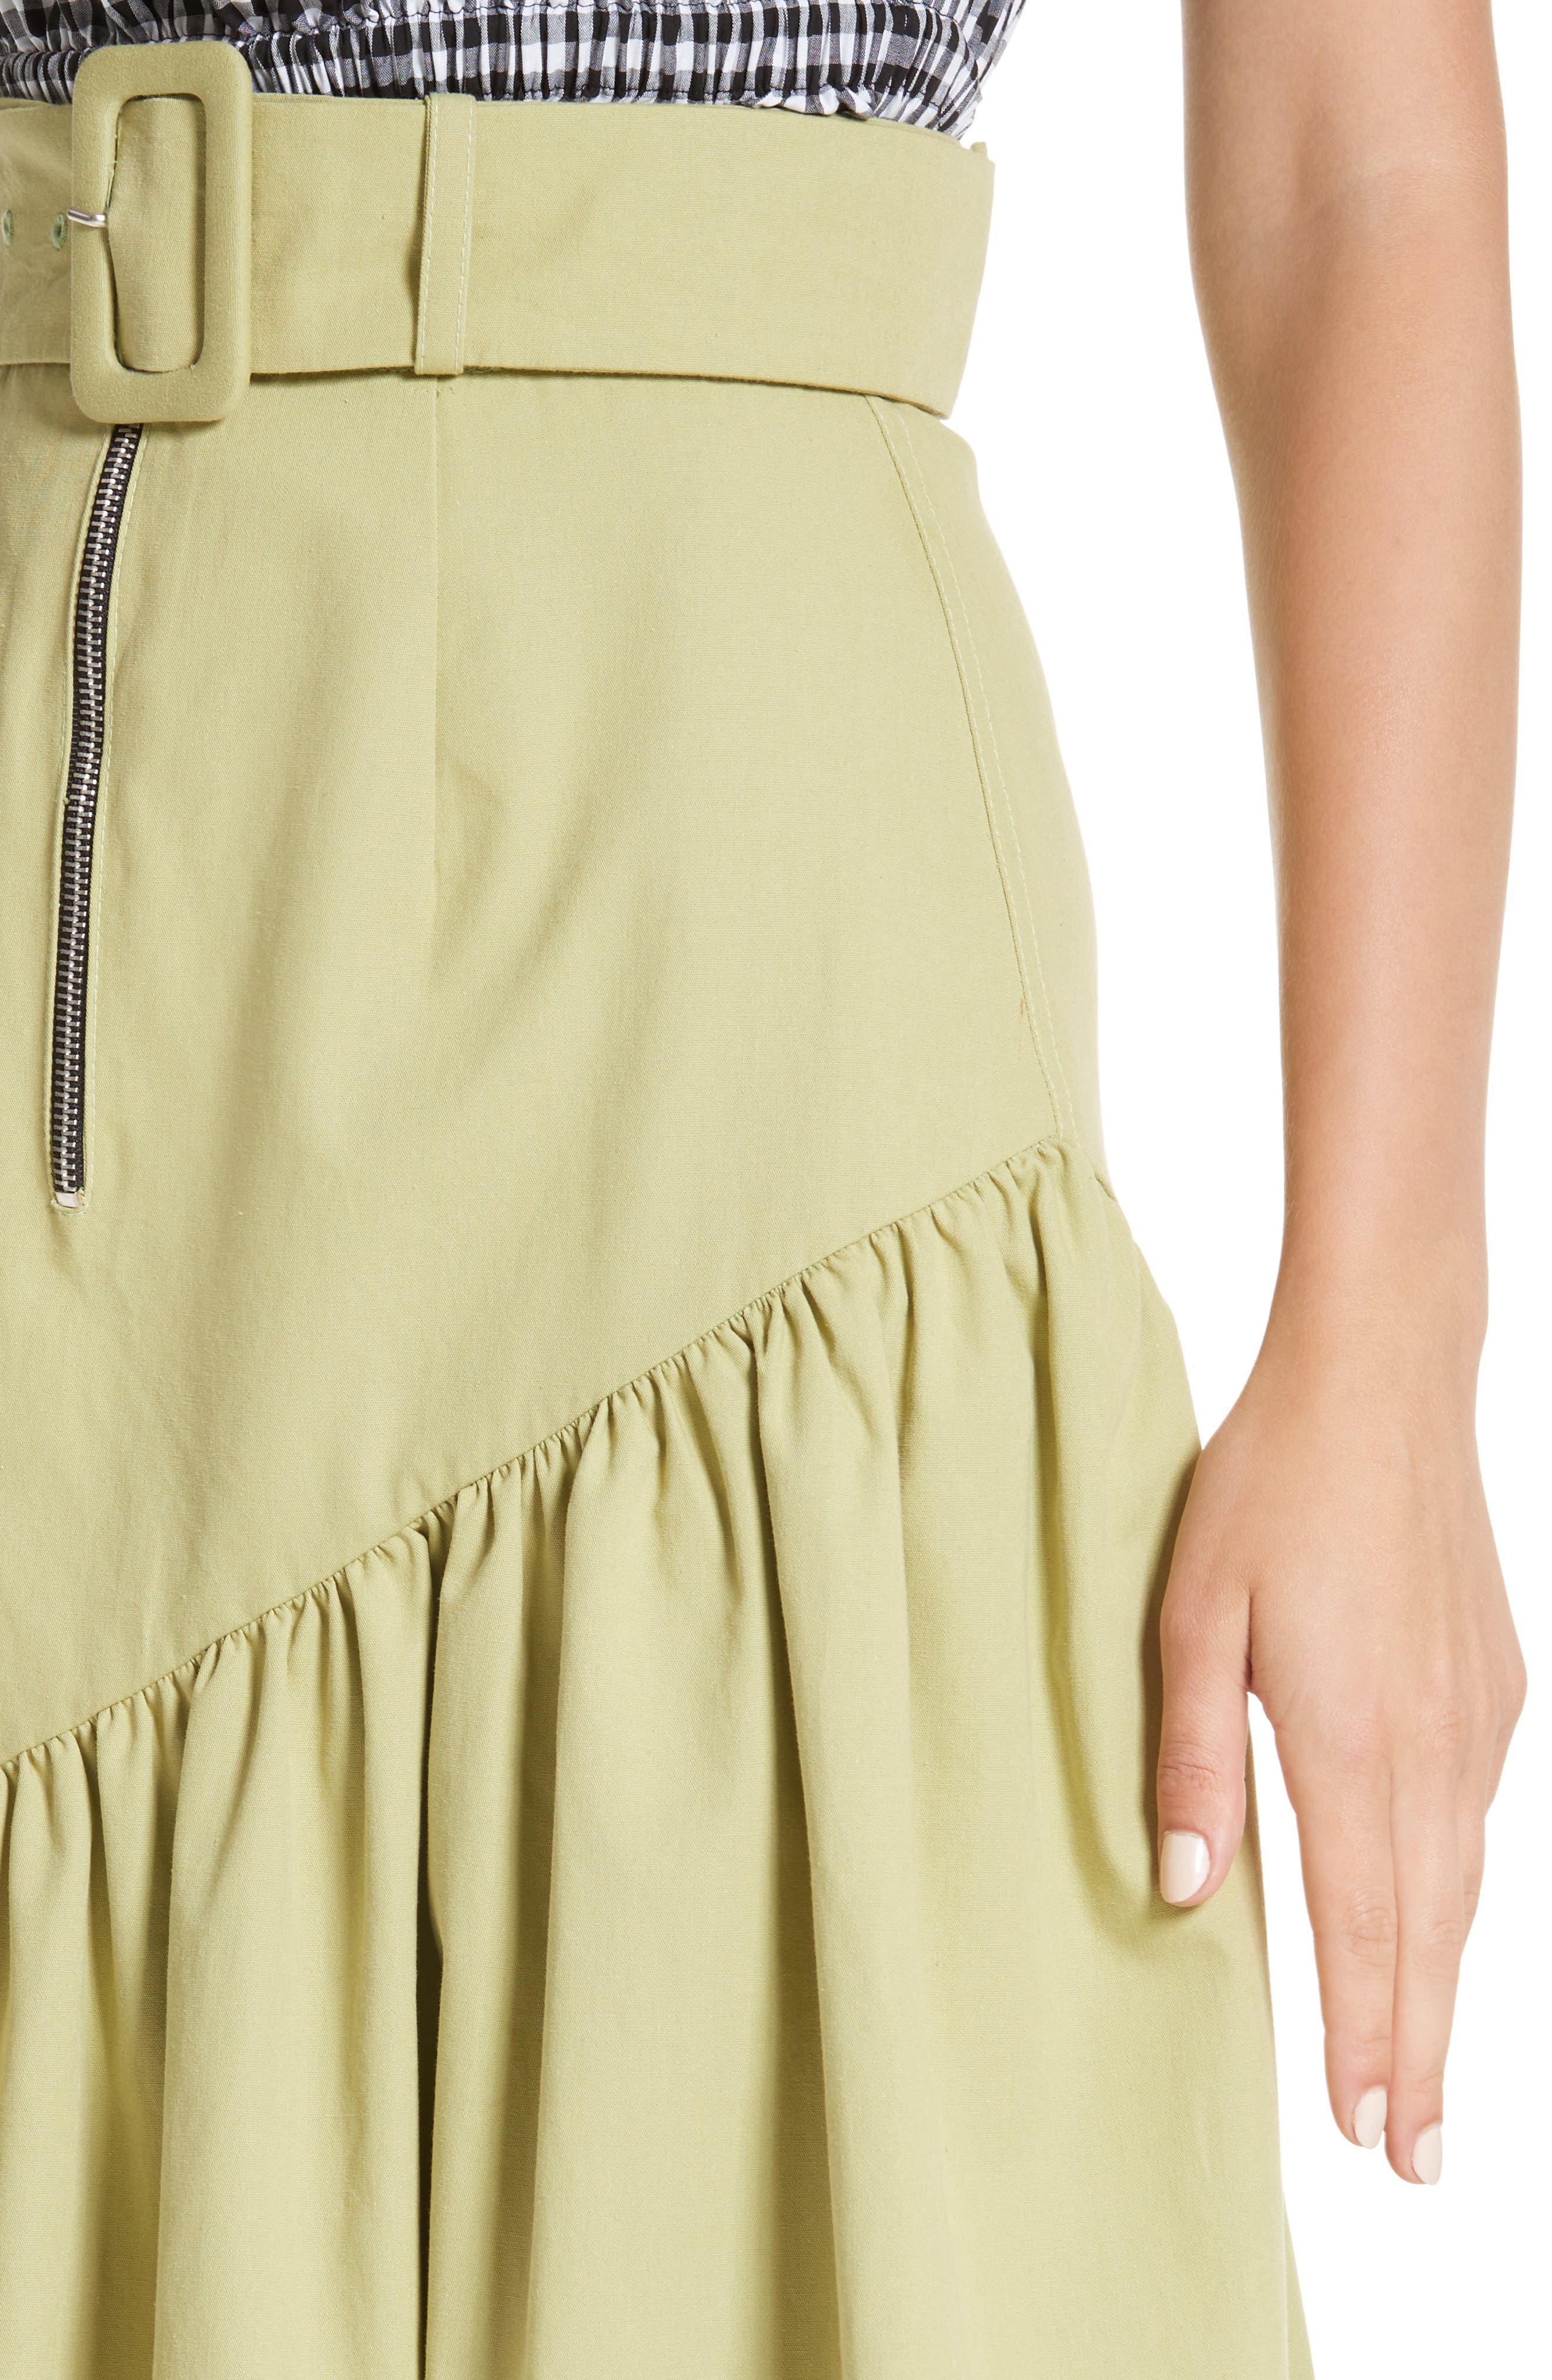 Belted High Waist Ruffle Skirt,                             Alternate thumbnail 4, color,                             370